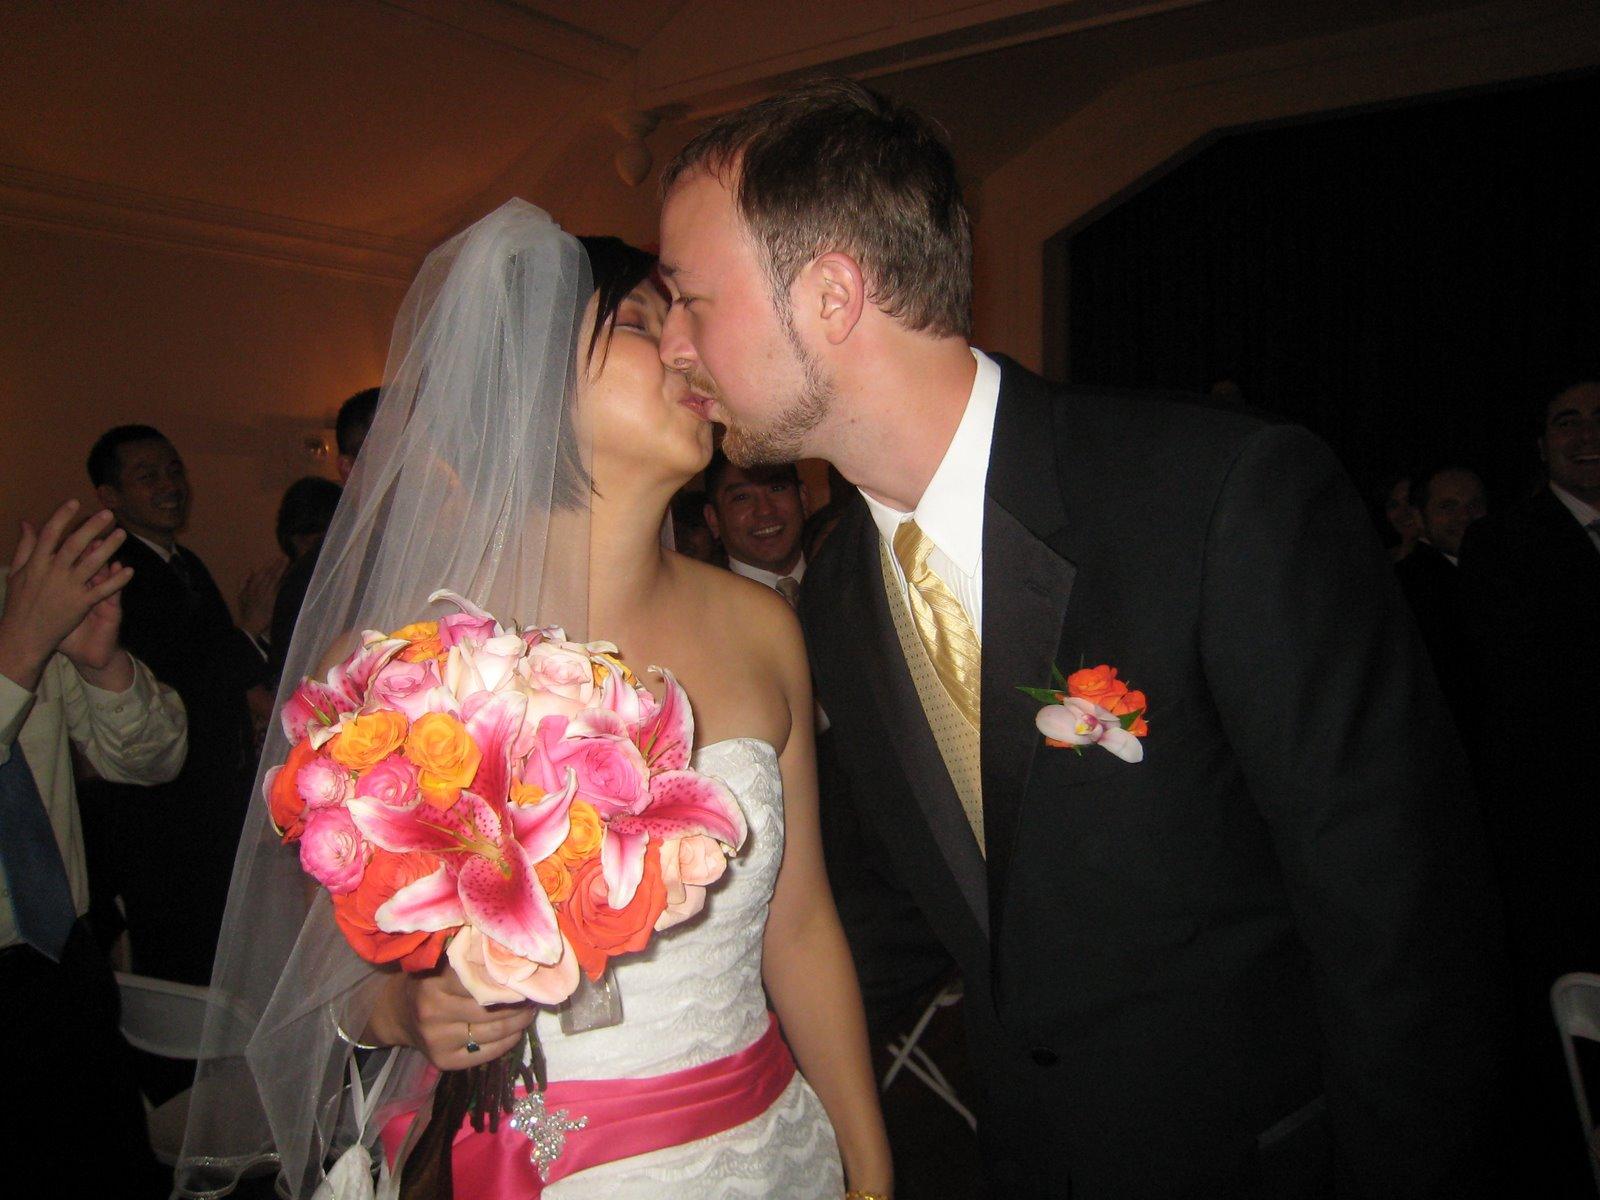 [Baird+Wedding+bouquet]